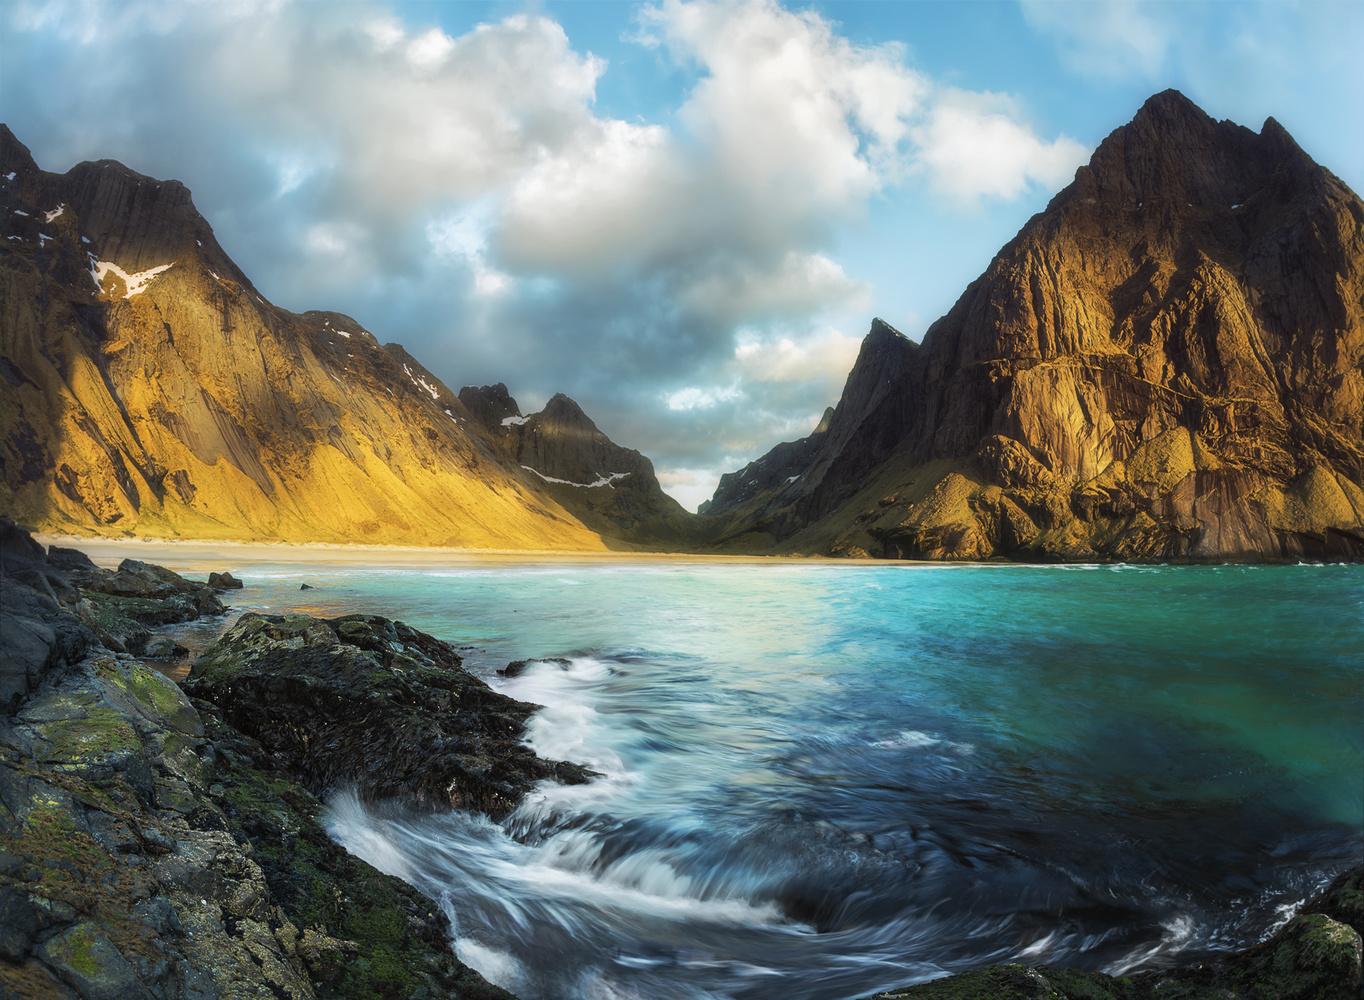 Lofoten Islands - Horseid Beach by Tim Schiphorst